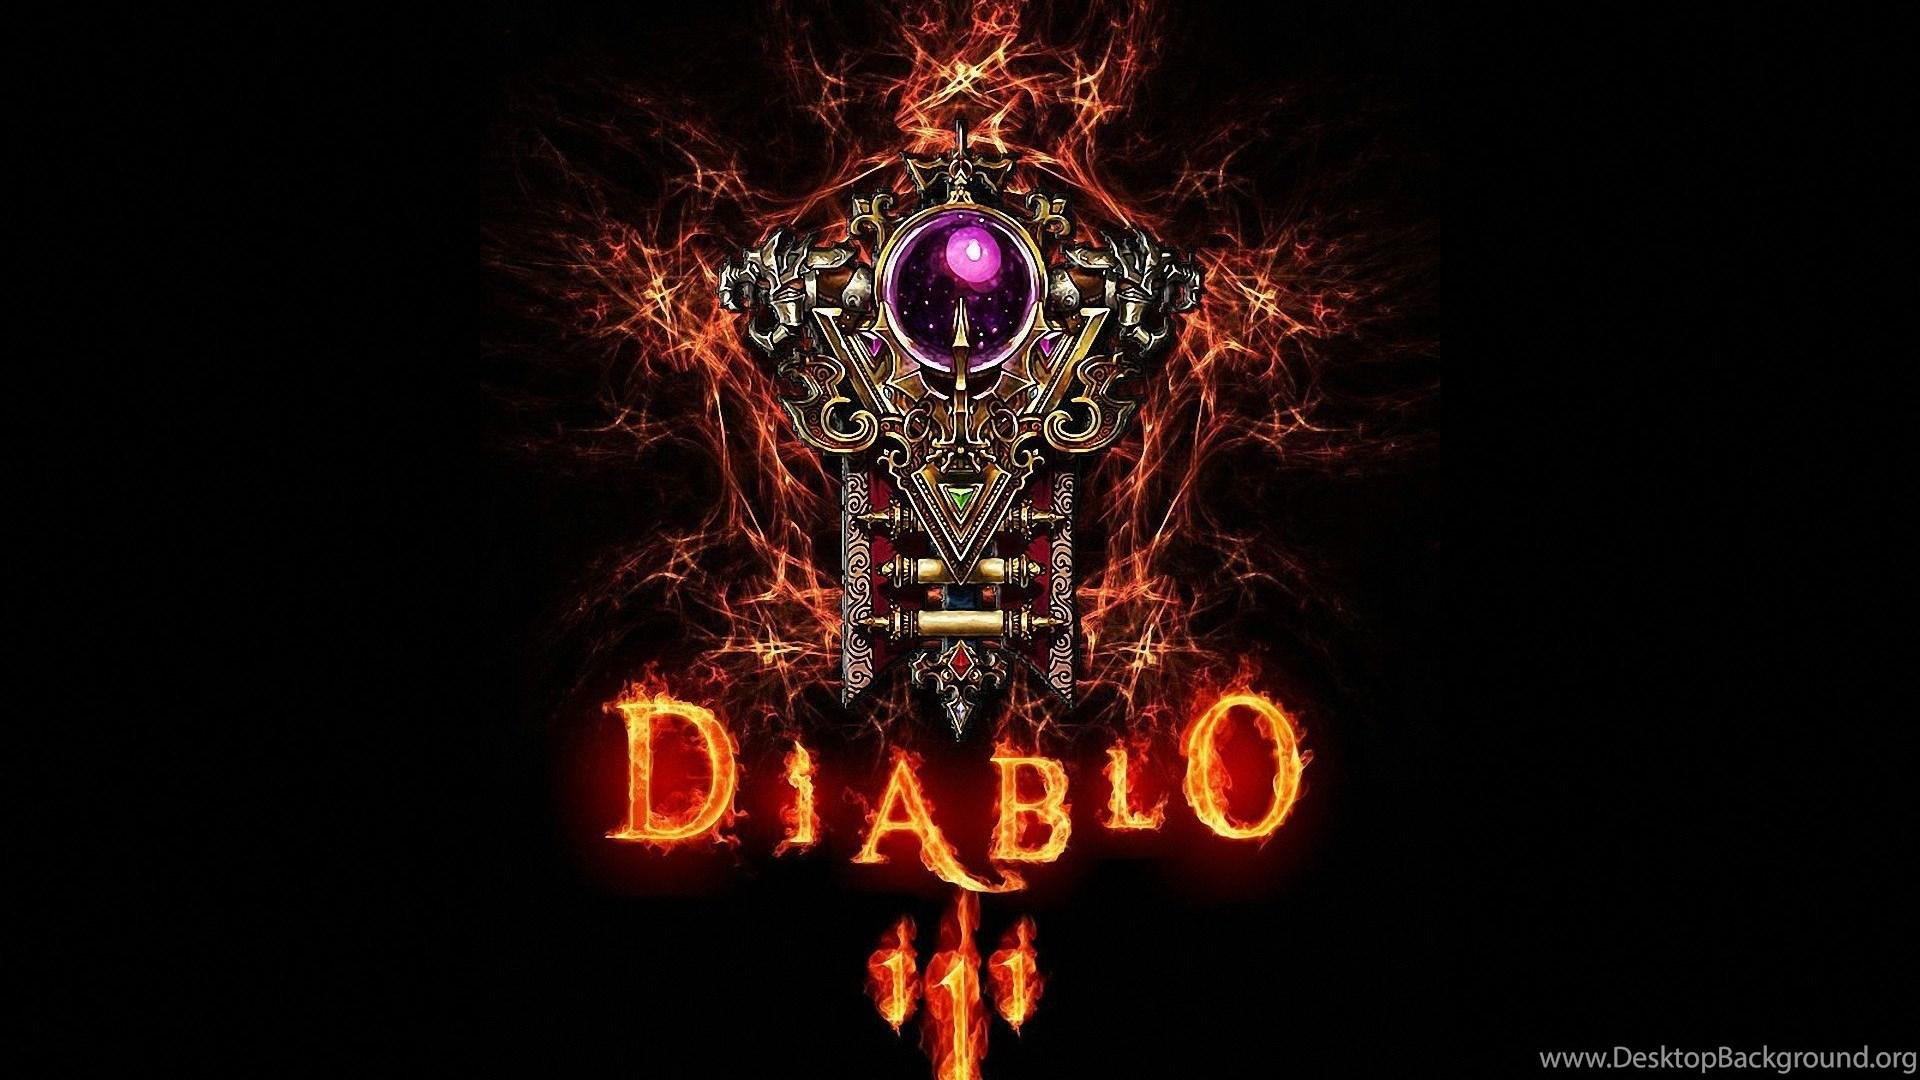 Diablo 3 hd wallpaper 1920x1080 for Joshua motors vineland nj inventory